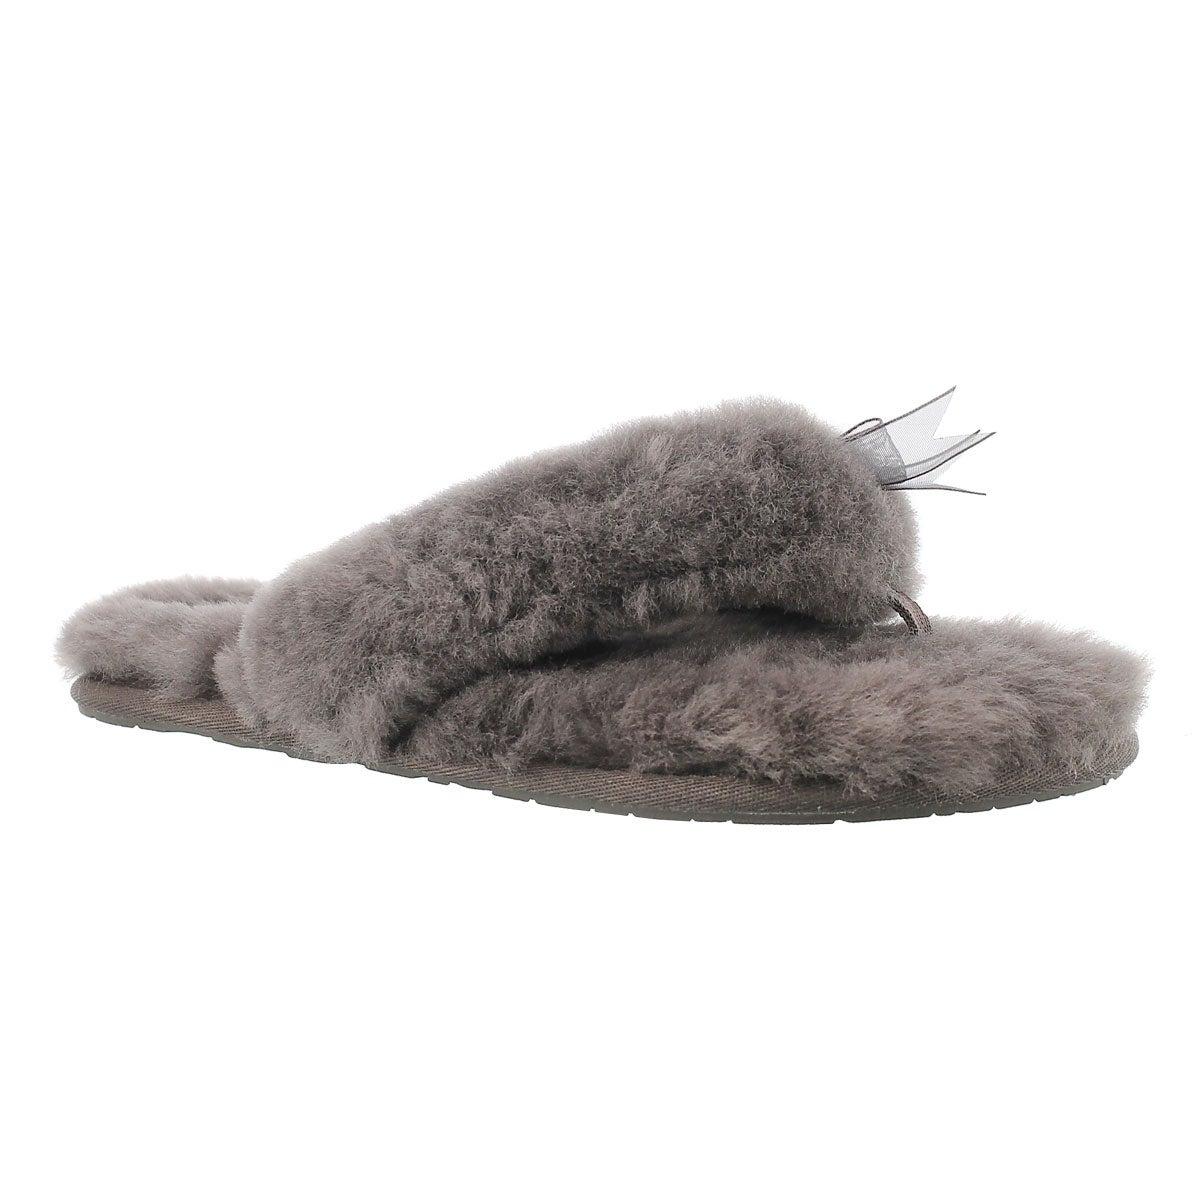 b0287ca2d38 Ugg Sheepskin Thong Slippers